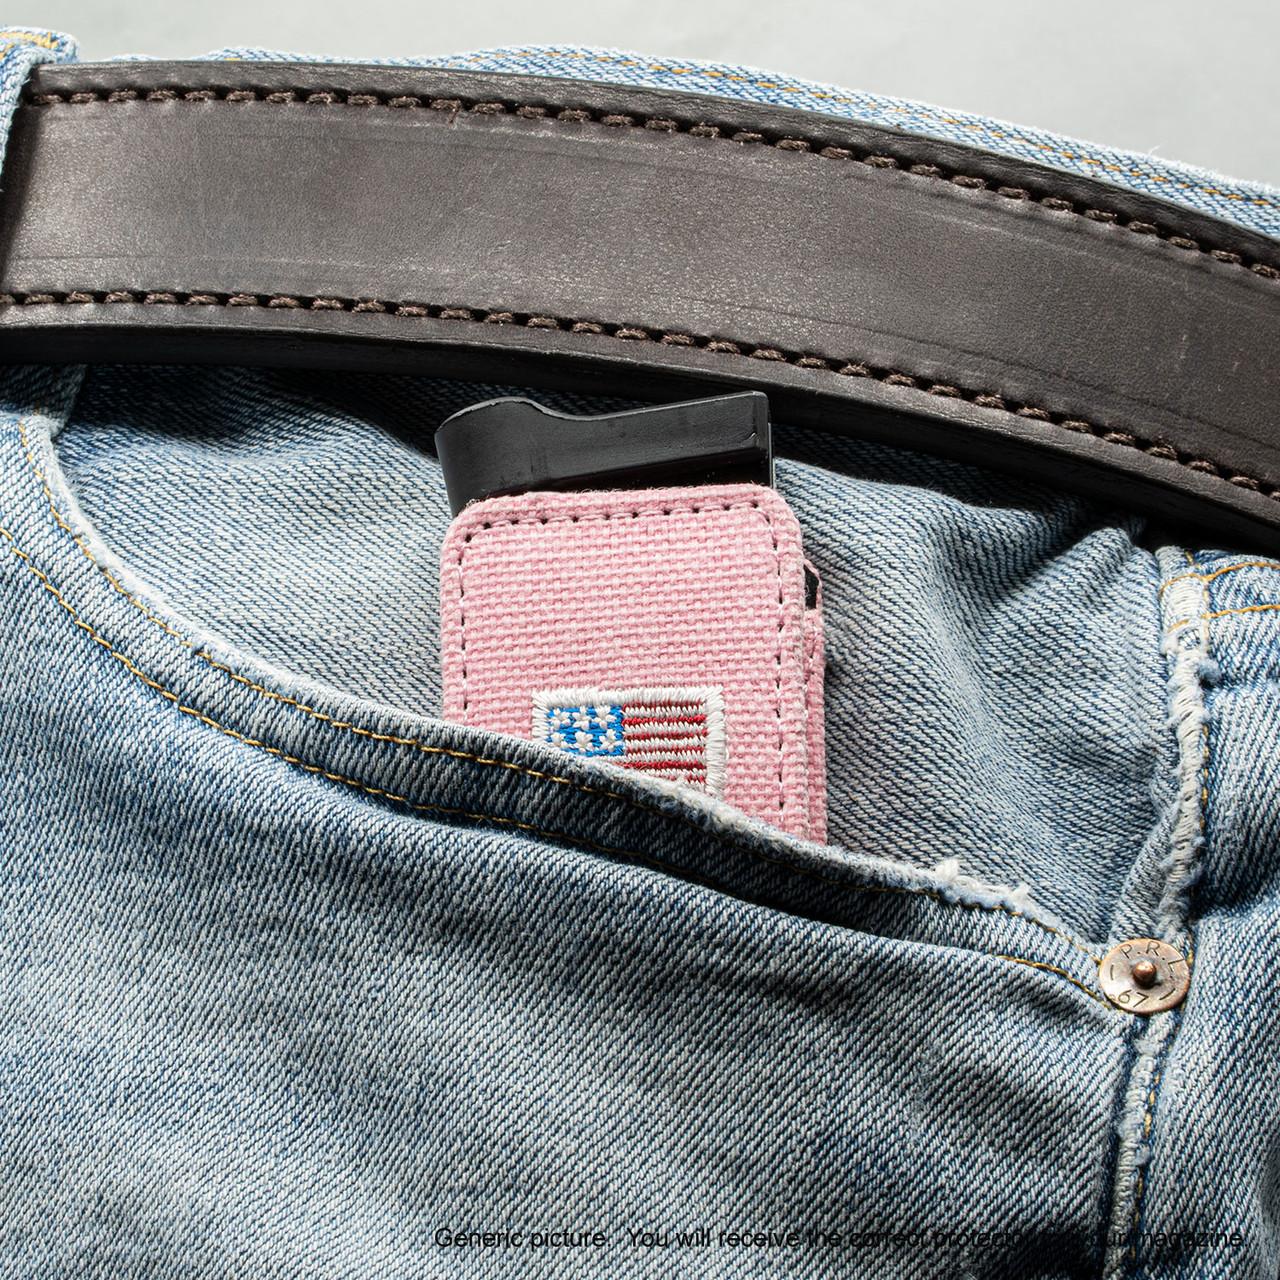 Glock 19X Pink Canvas Flag Magazine Pocket Protector